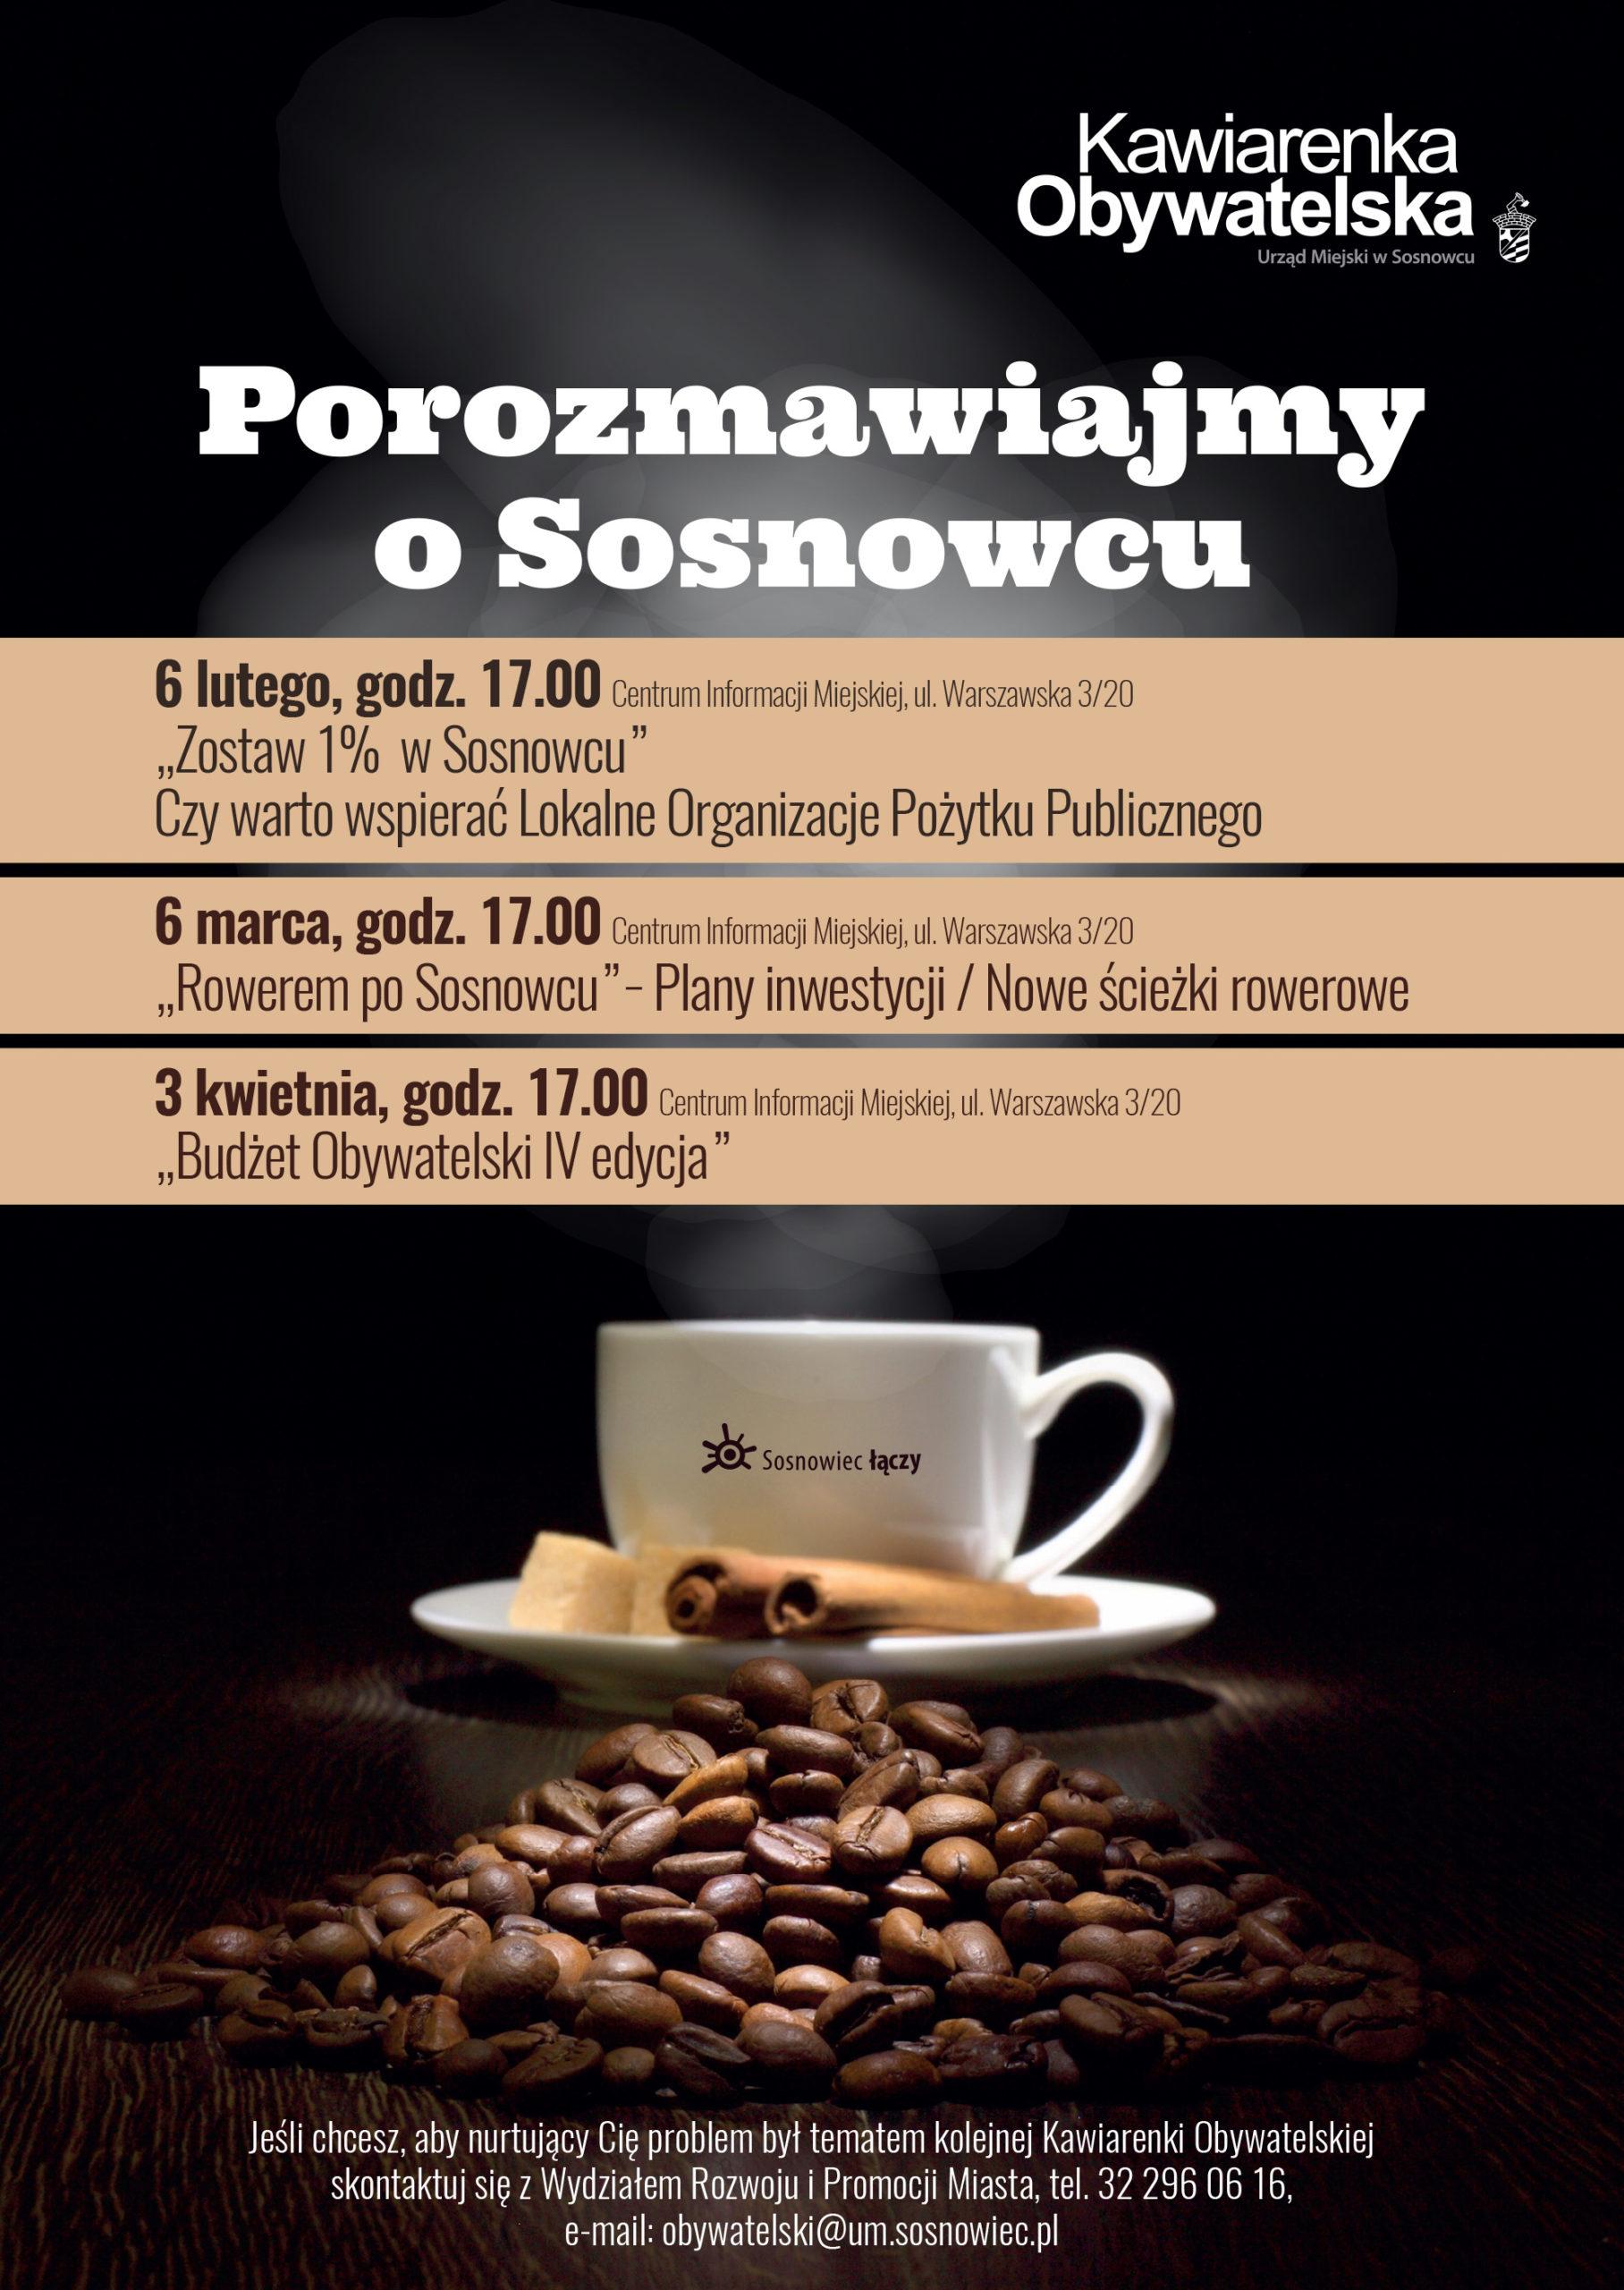 kawiarenka obywatelska